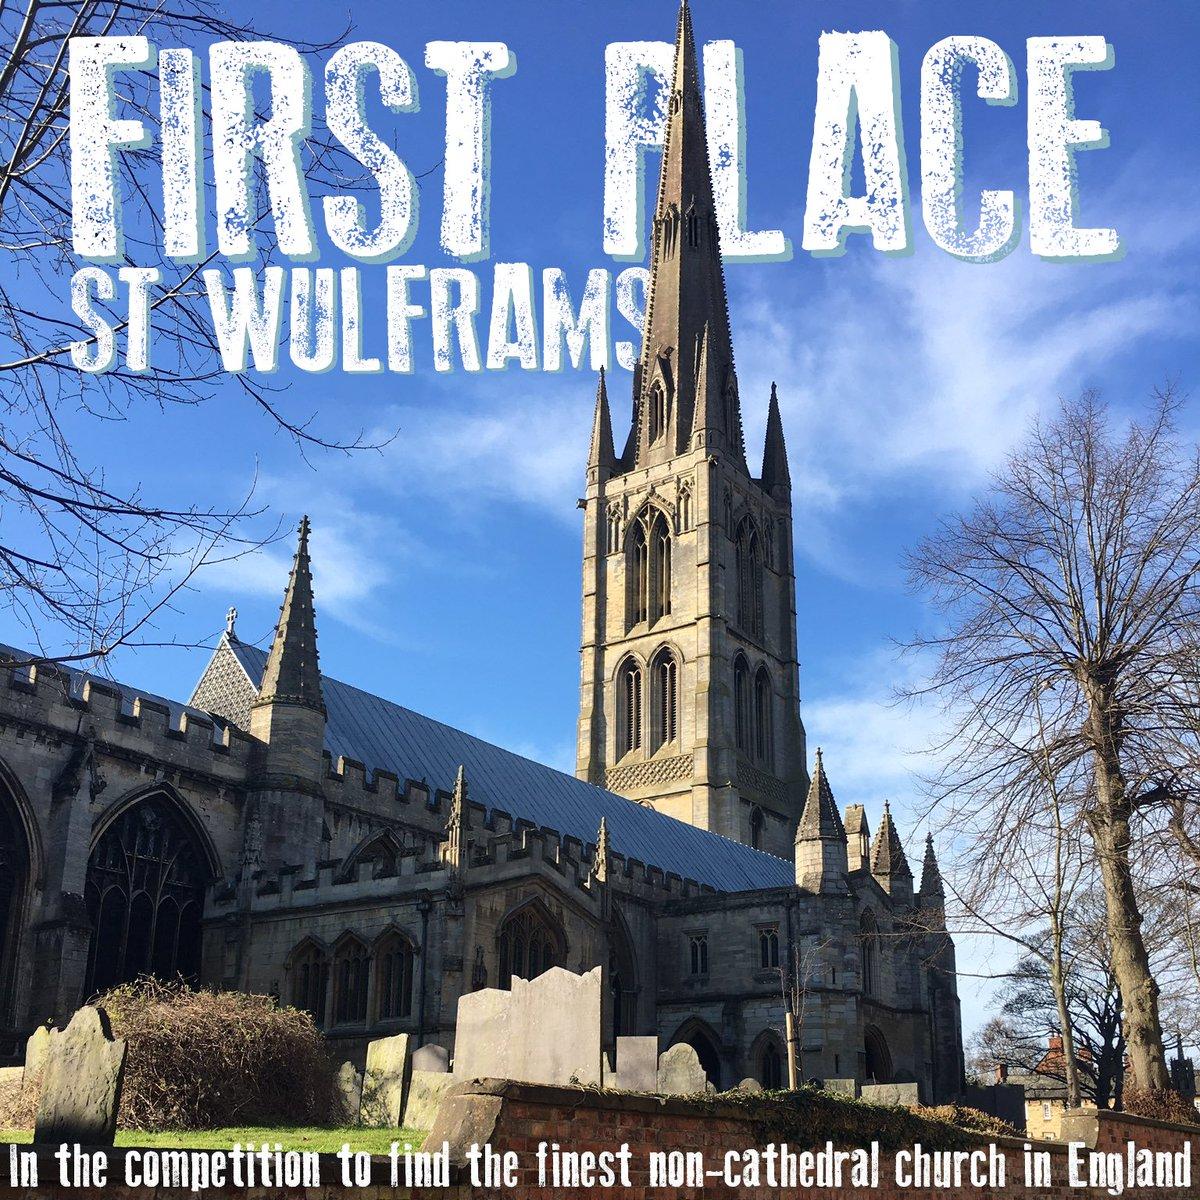 The Winner is @StWulframs Church, in Grantham! Congratulations! https://t.co/8y26MeJOQN